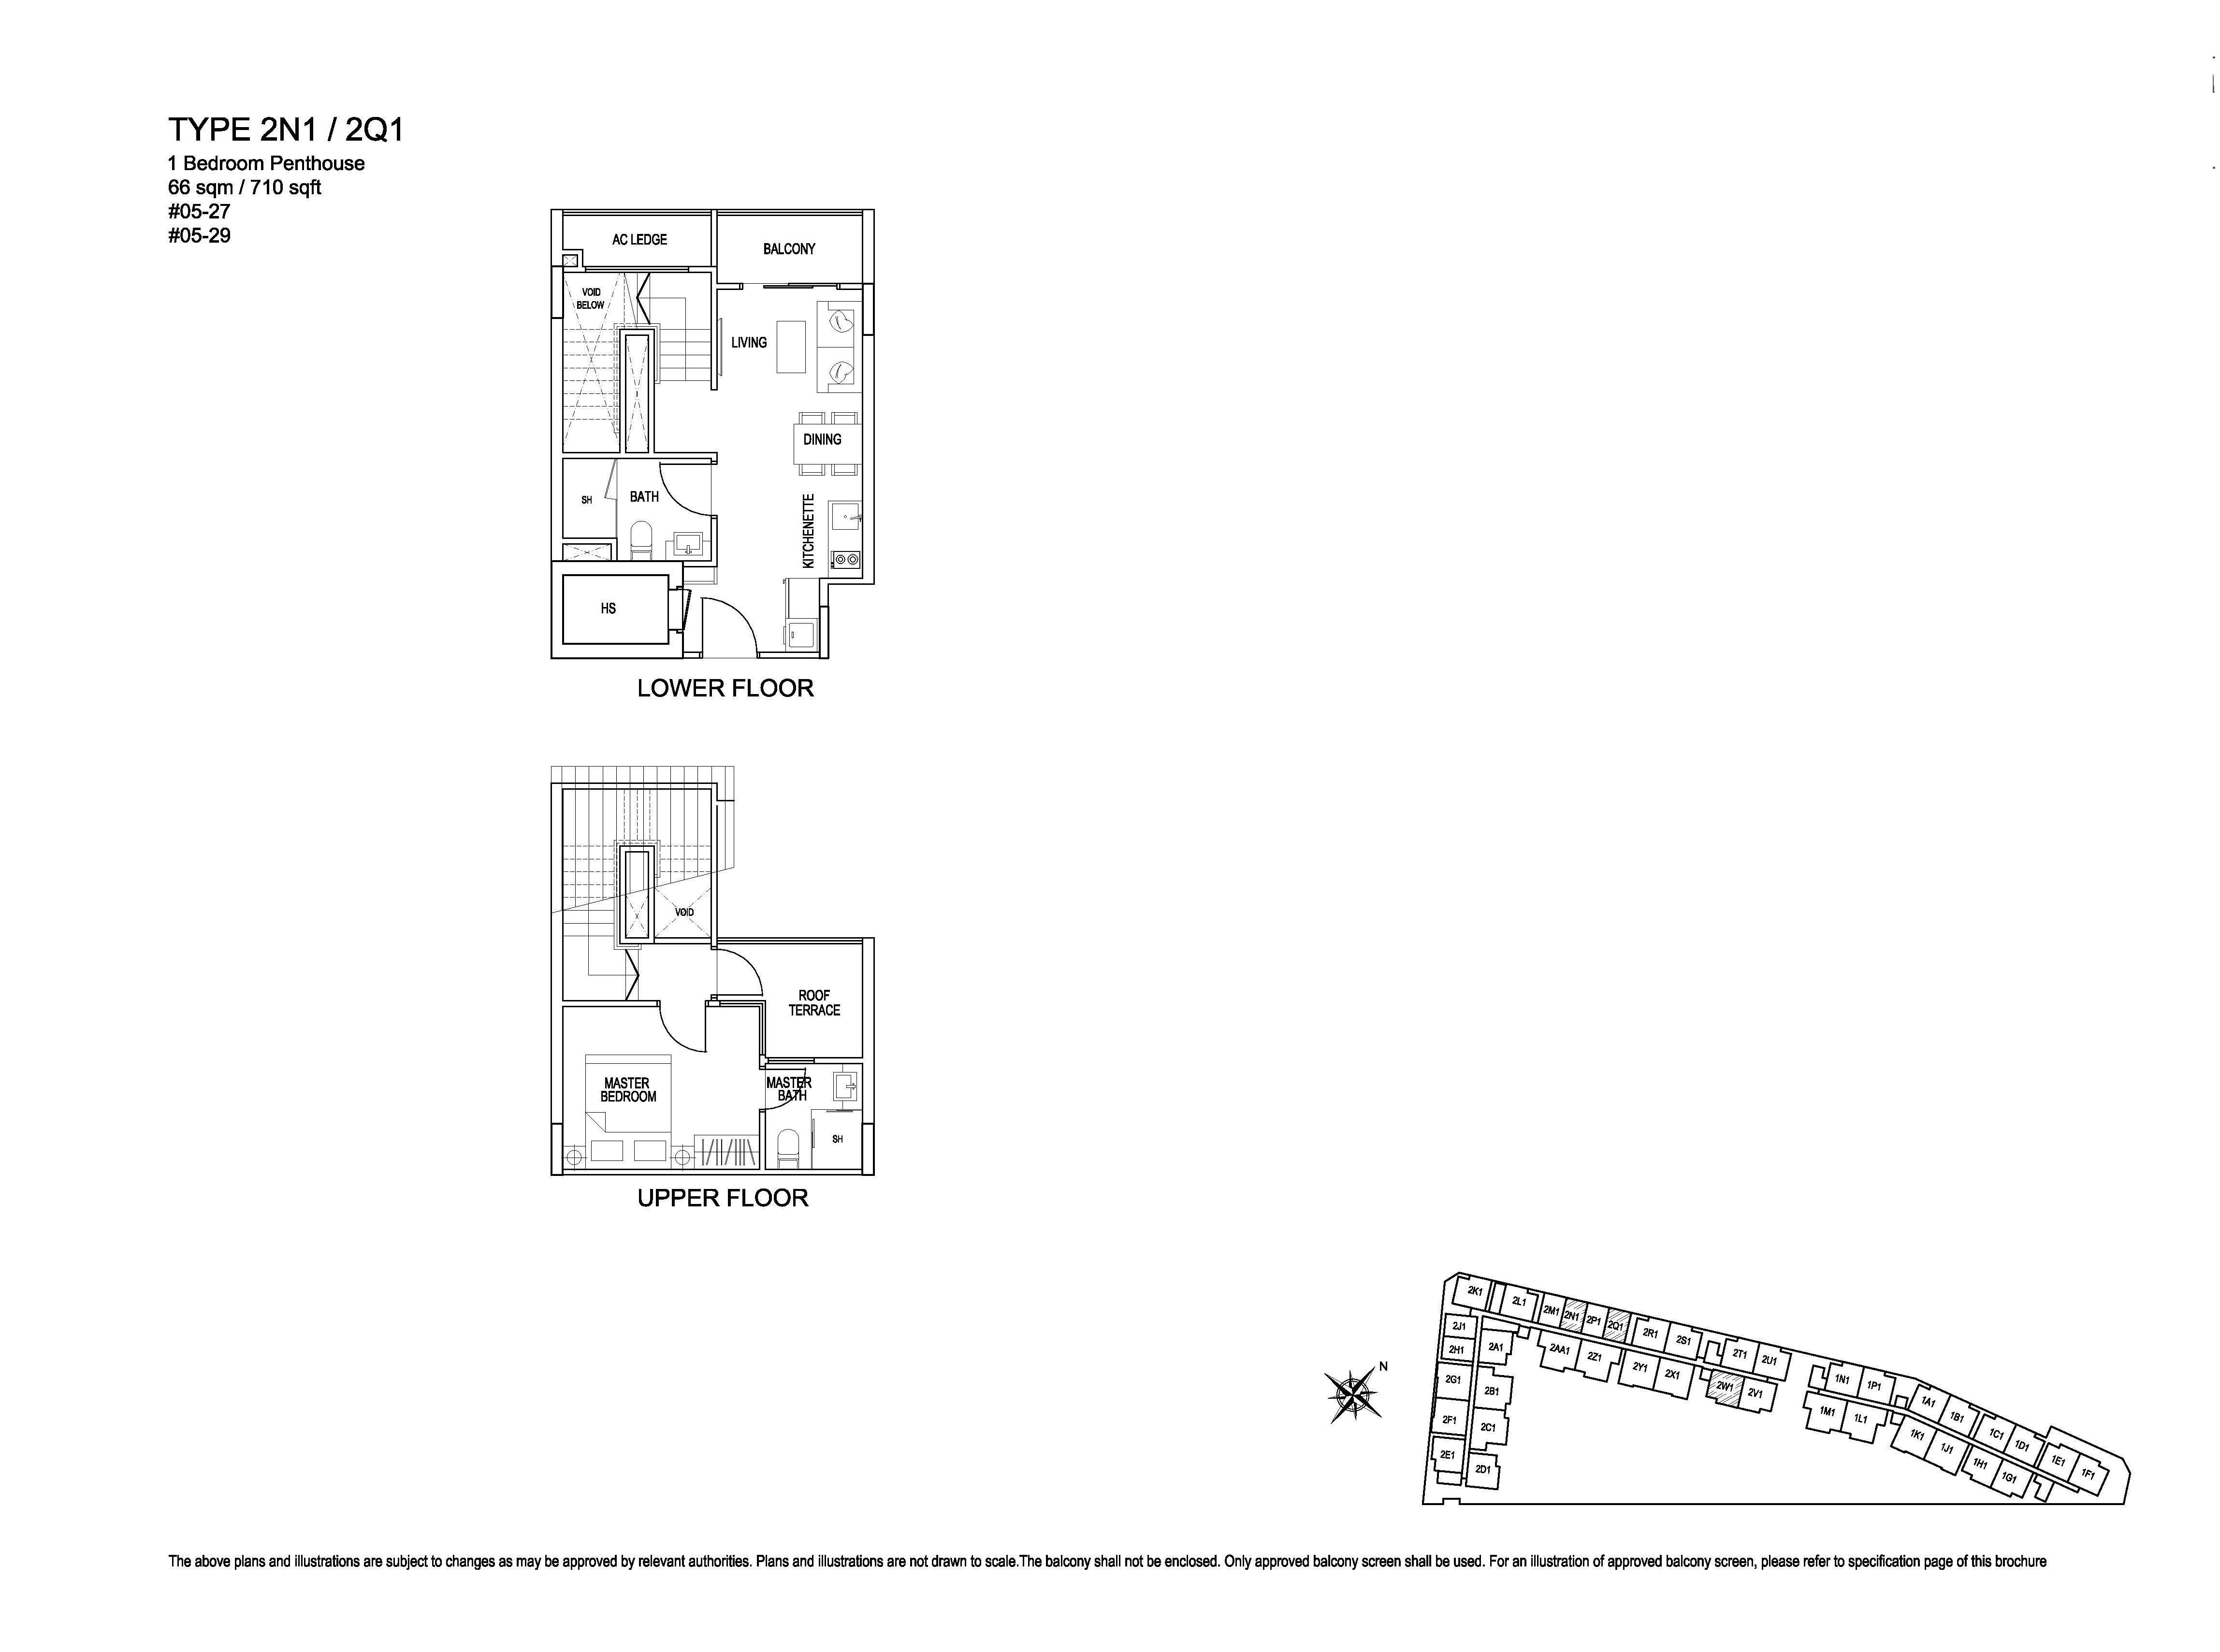 Kensington Square 1 Bedroom Penthouse Floor Plans Type 2N1/2Q1